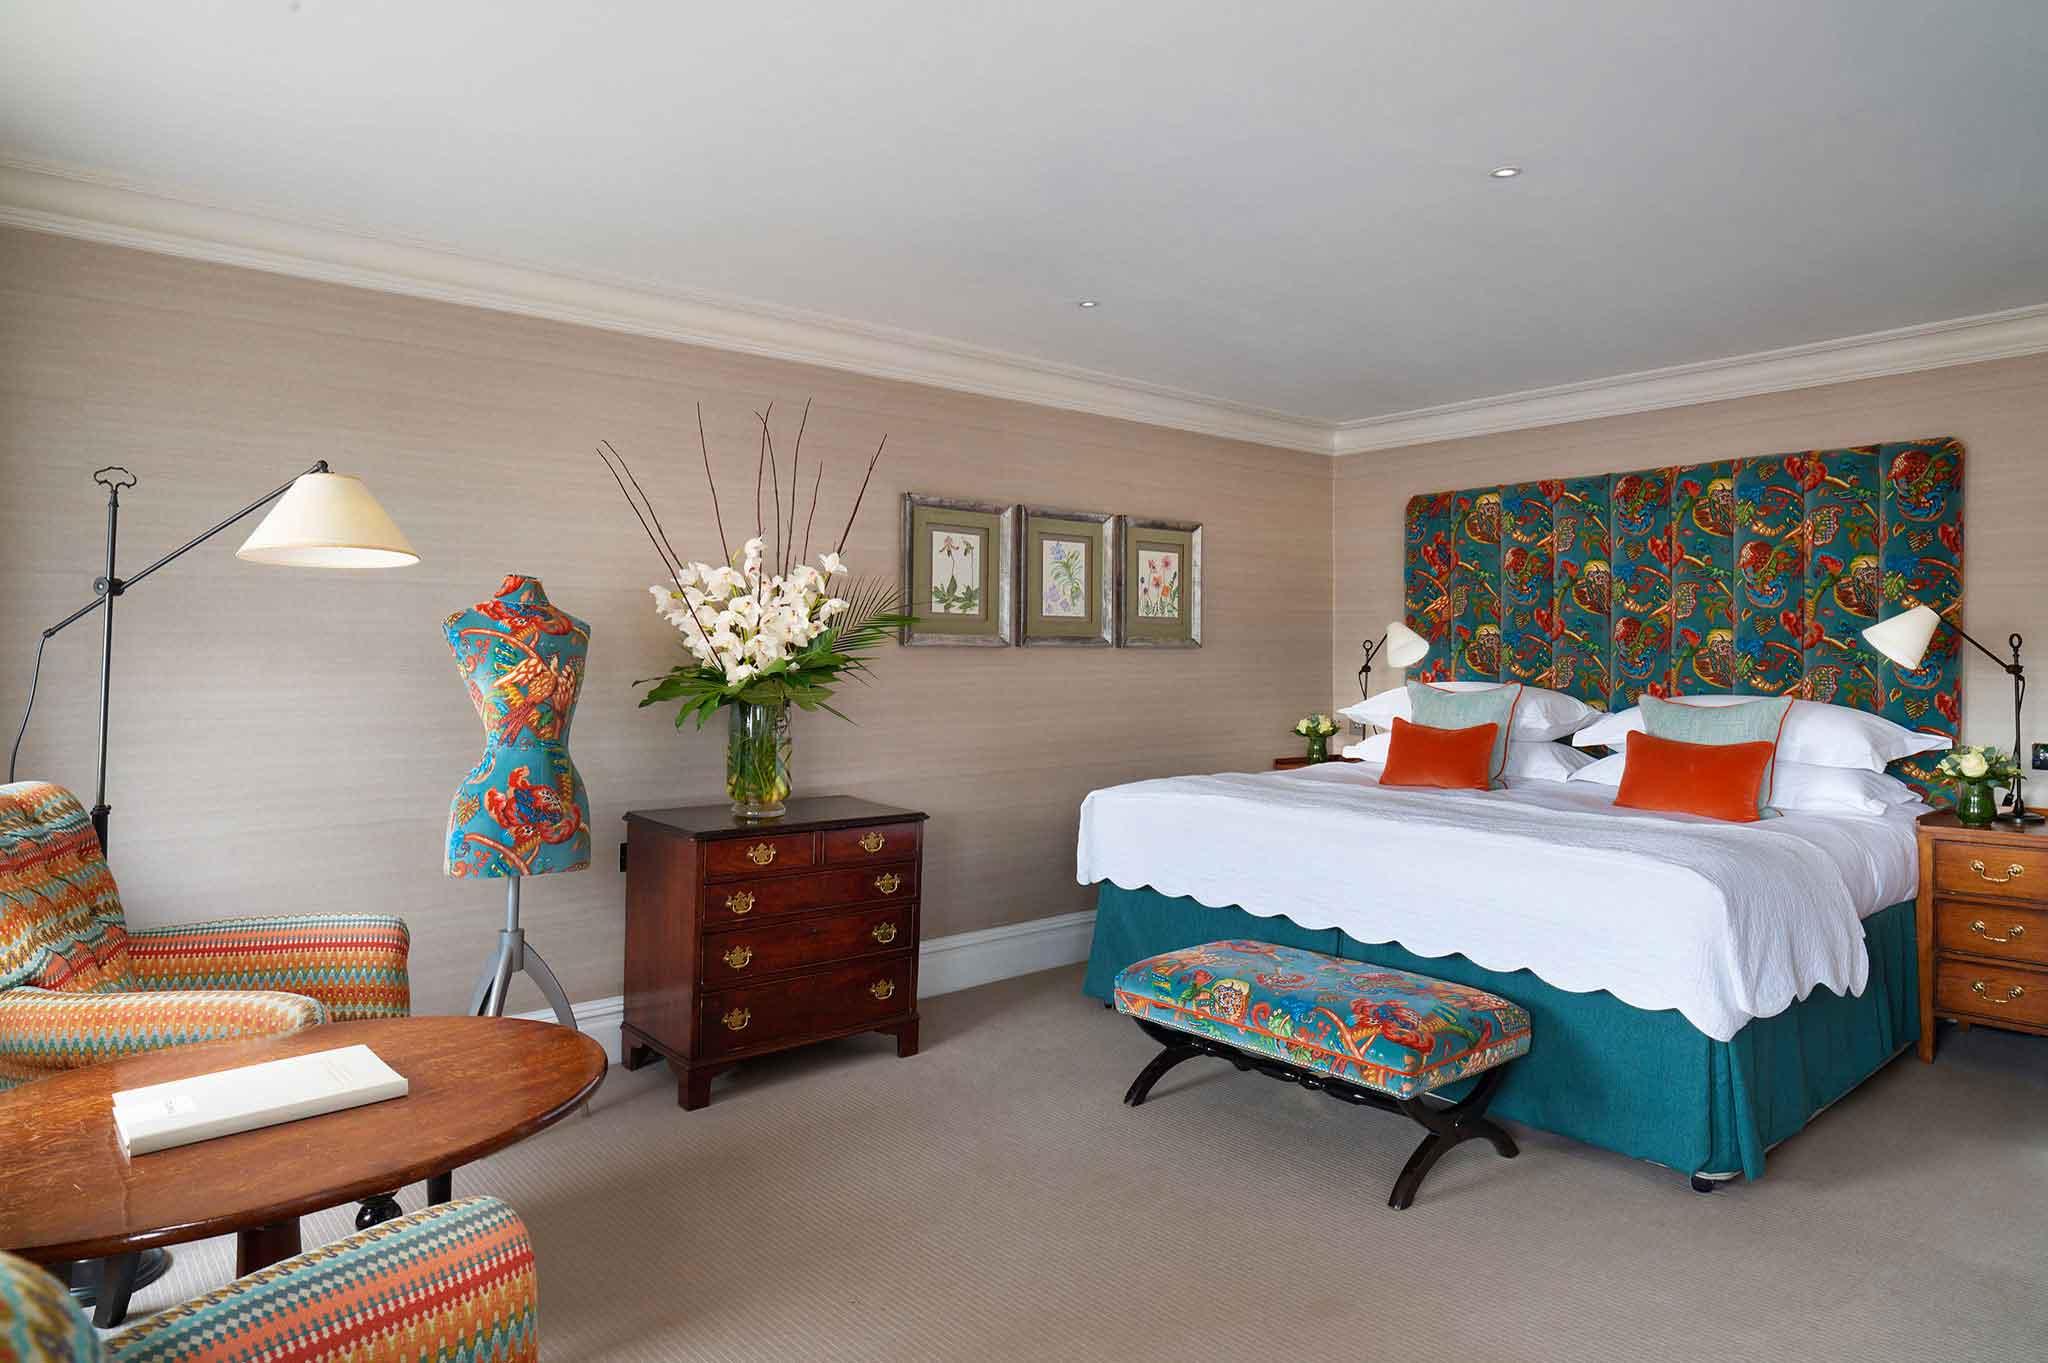 Pelham House Hotel Rooms